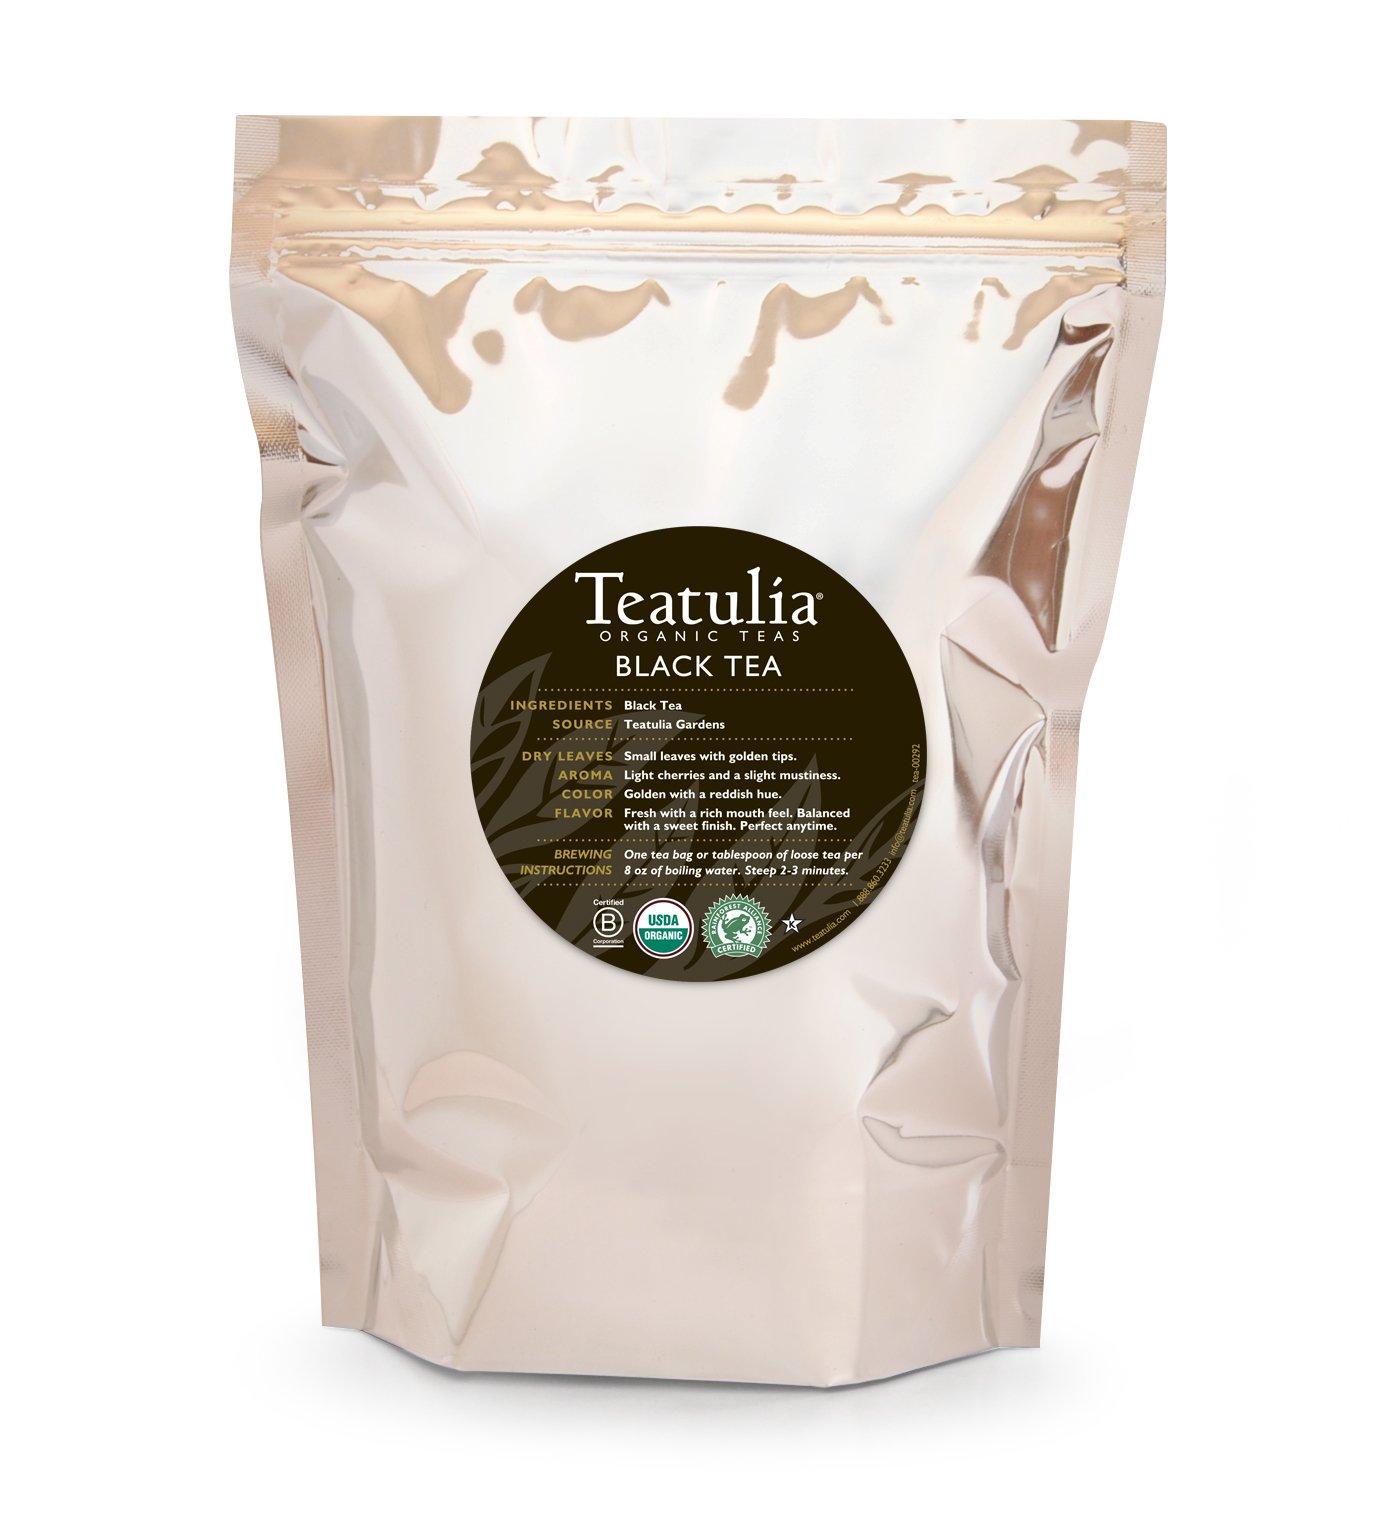 CDM product Teatulia Organic Loose Leaf Black Tea - 1lb Bag - 16oz - Brew Hot or Cold big image